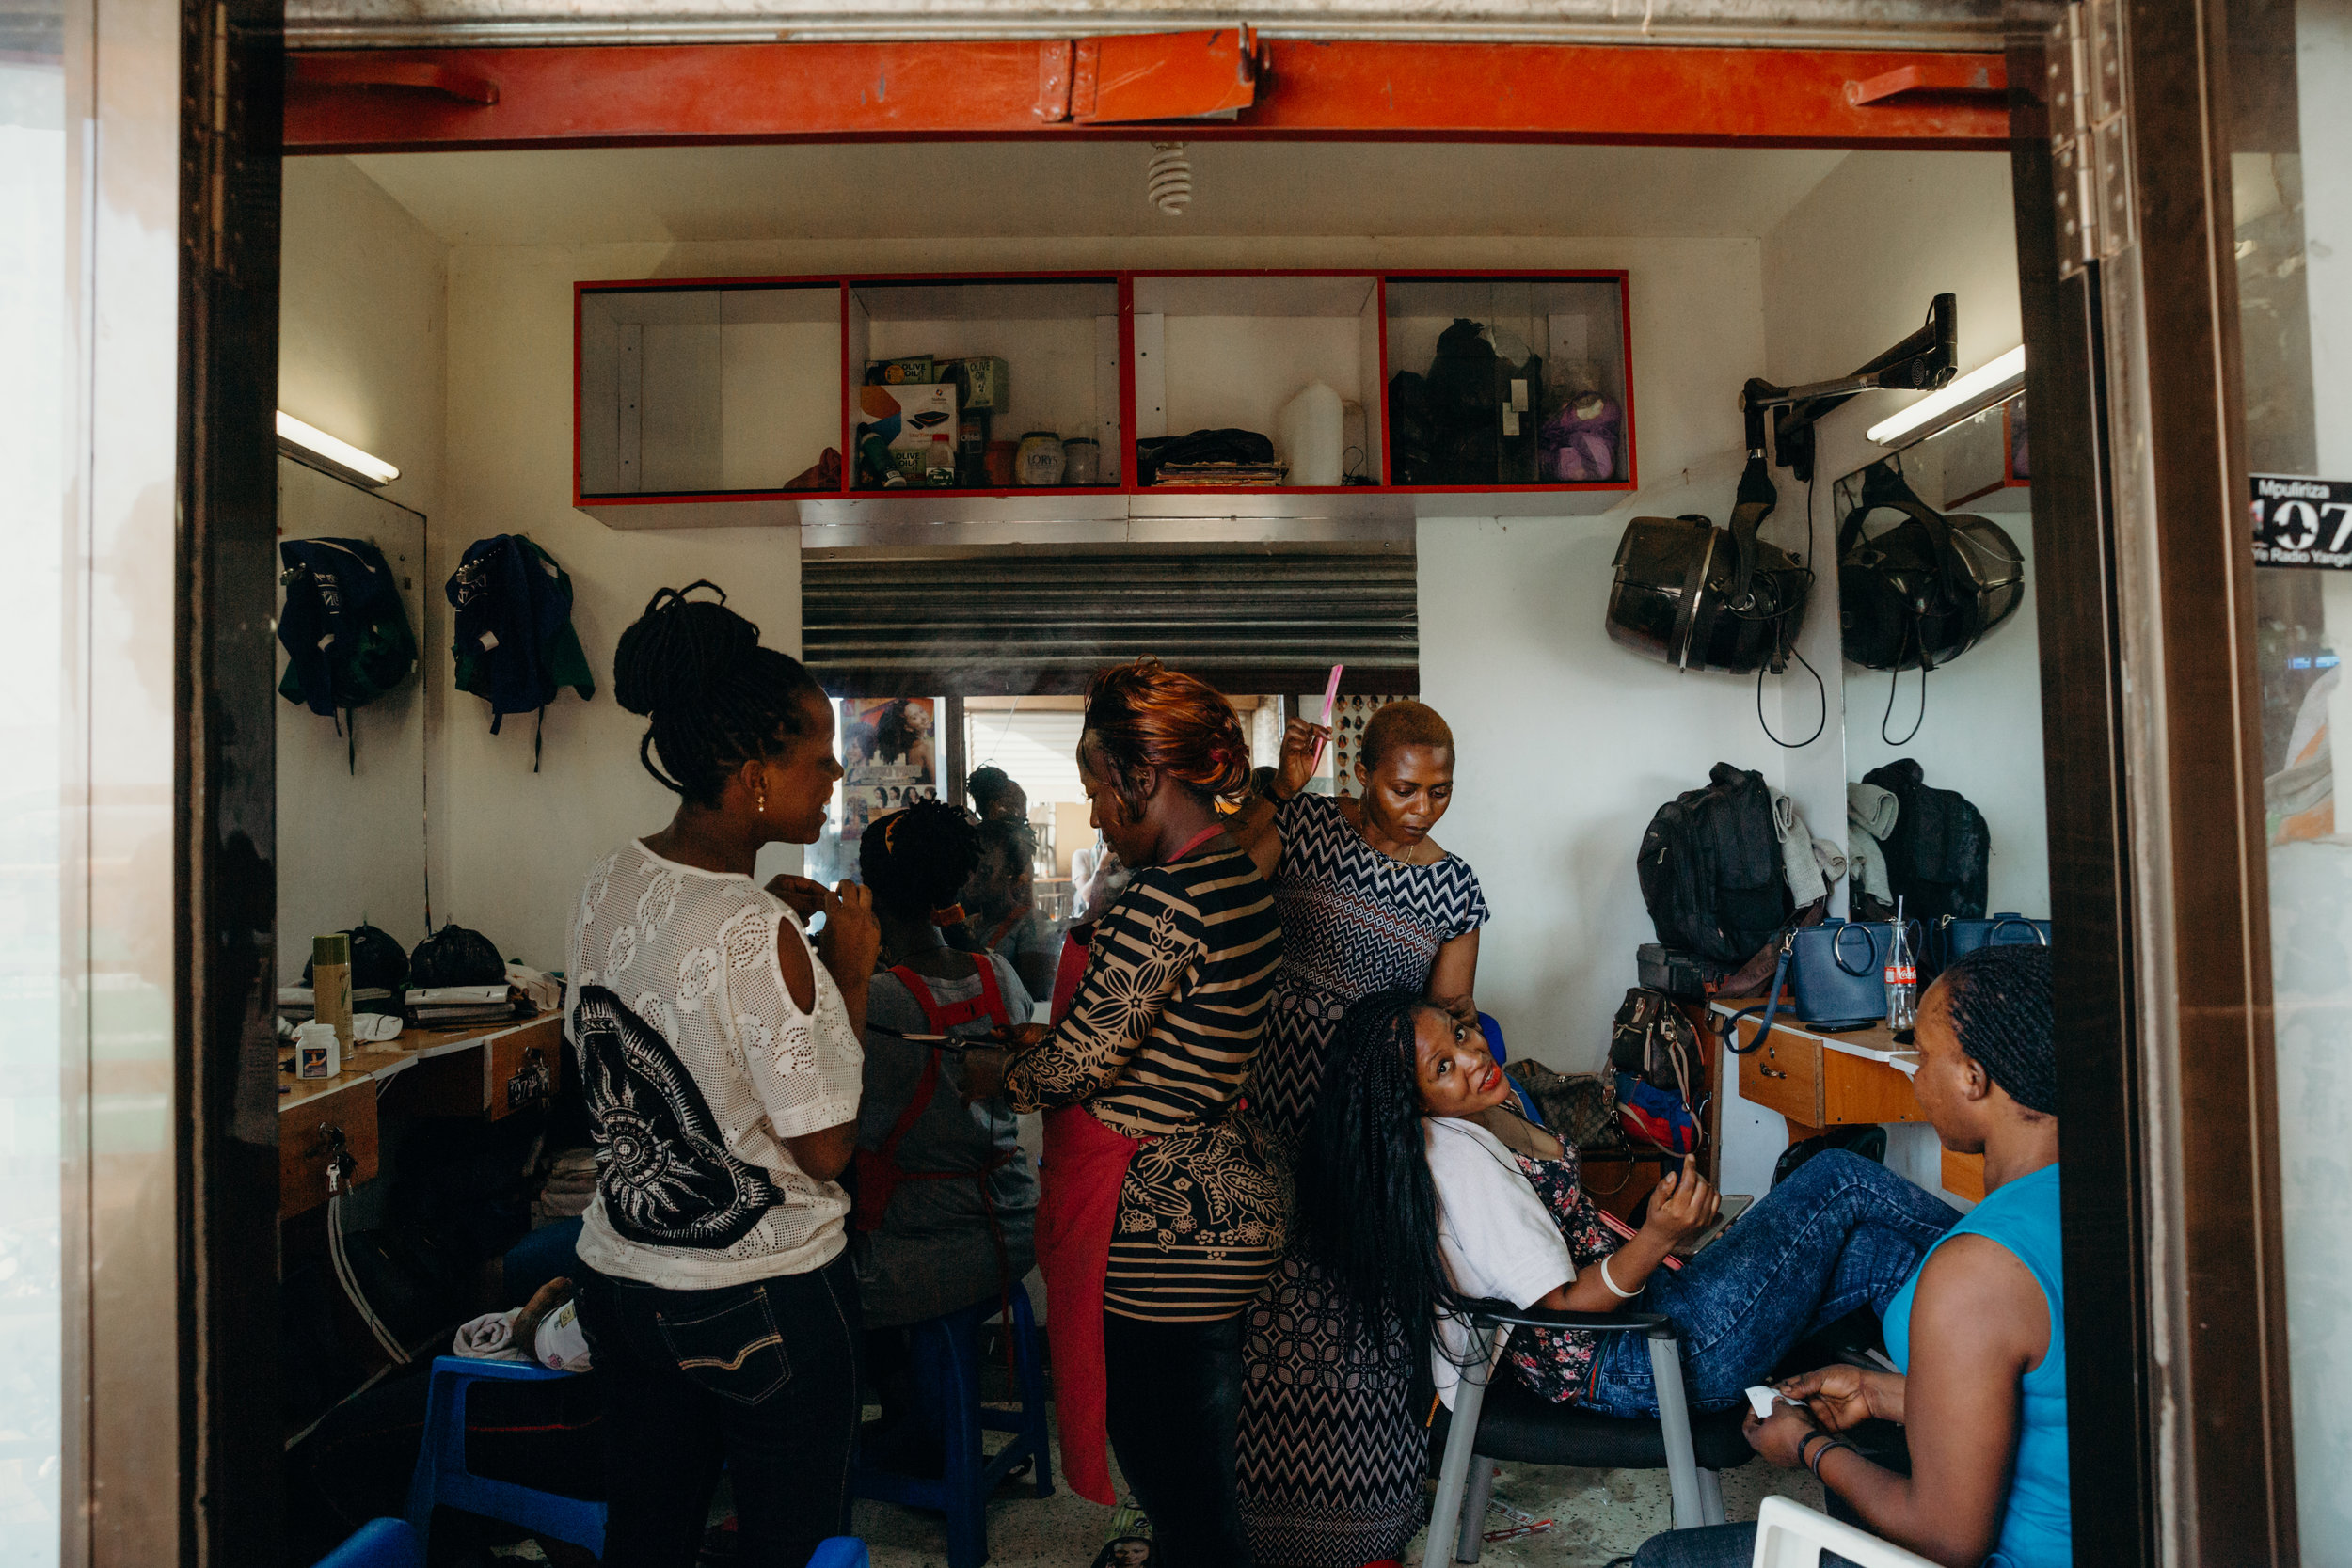 UgandaDay5StreetPhotos-39.jpg